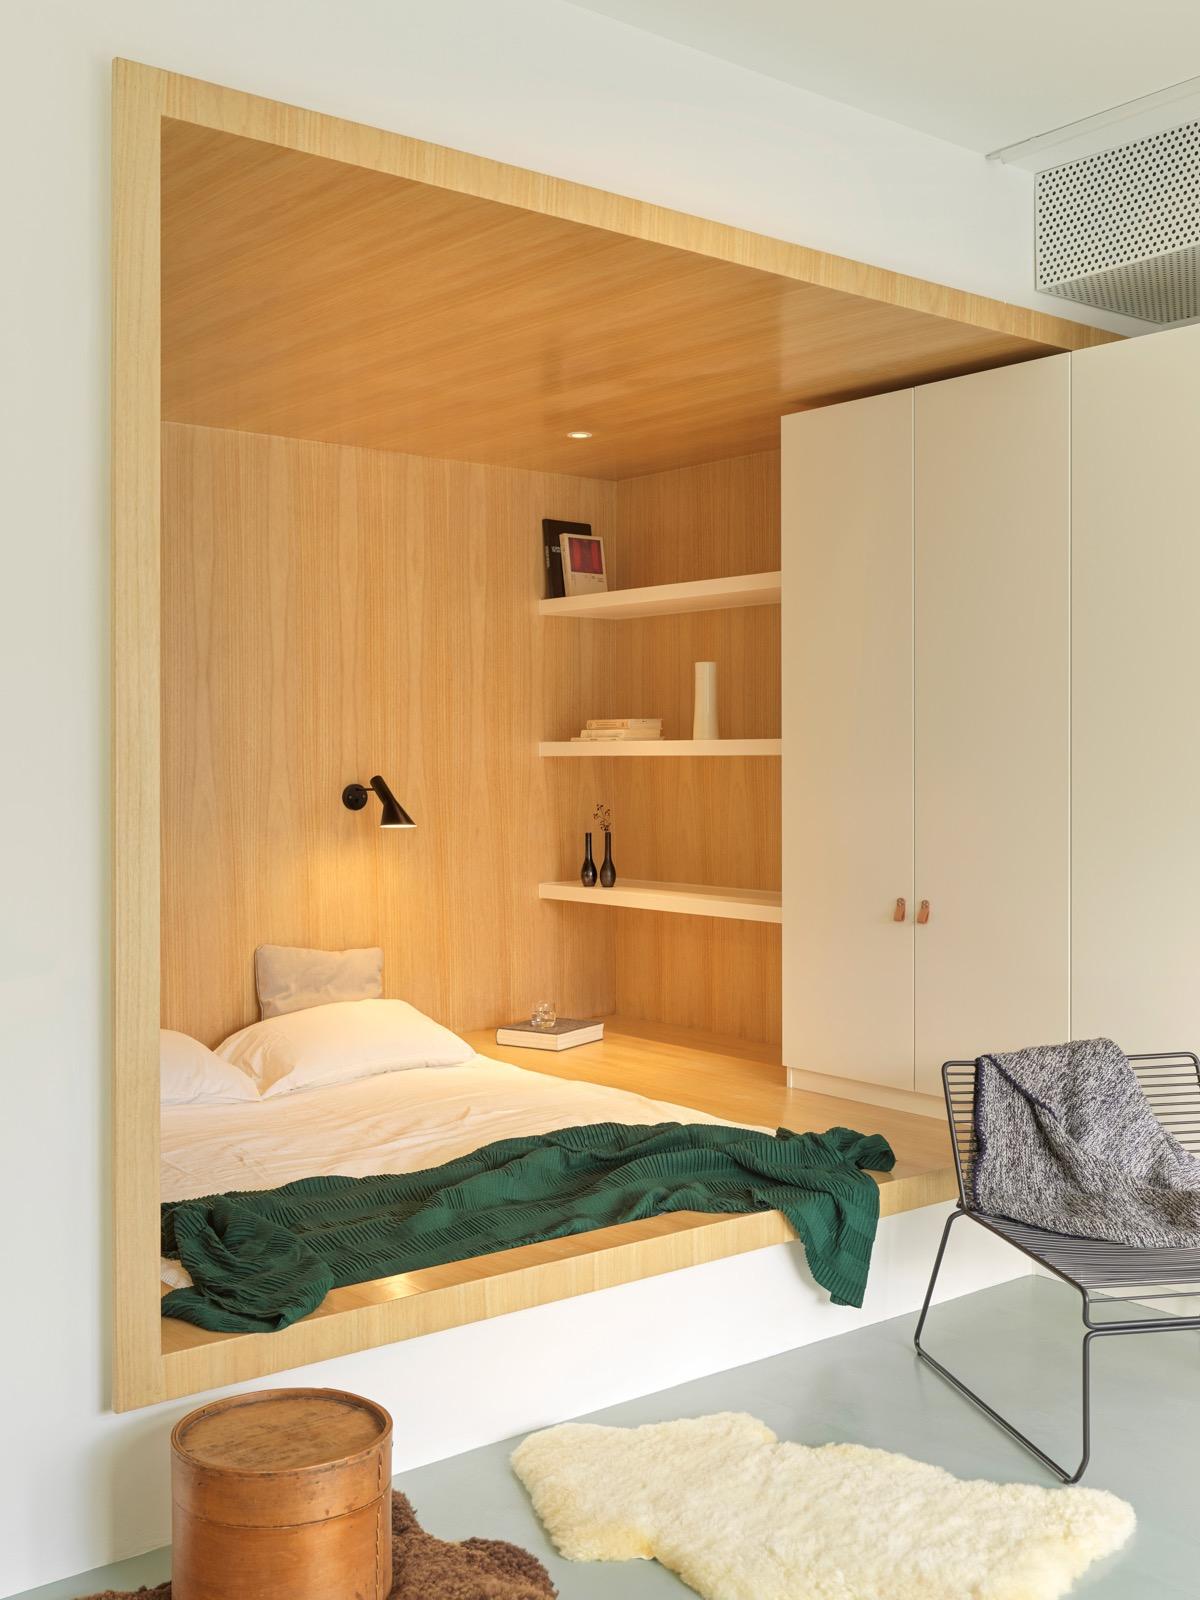 P住宅: 为年轻家庭打造的双层顶楼公寓